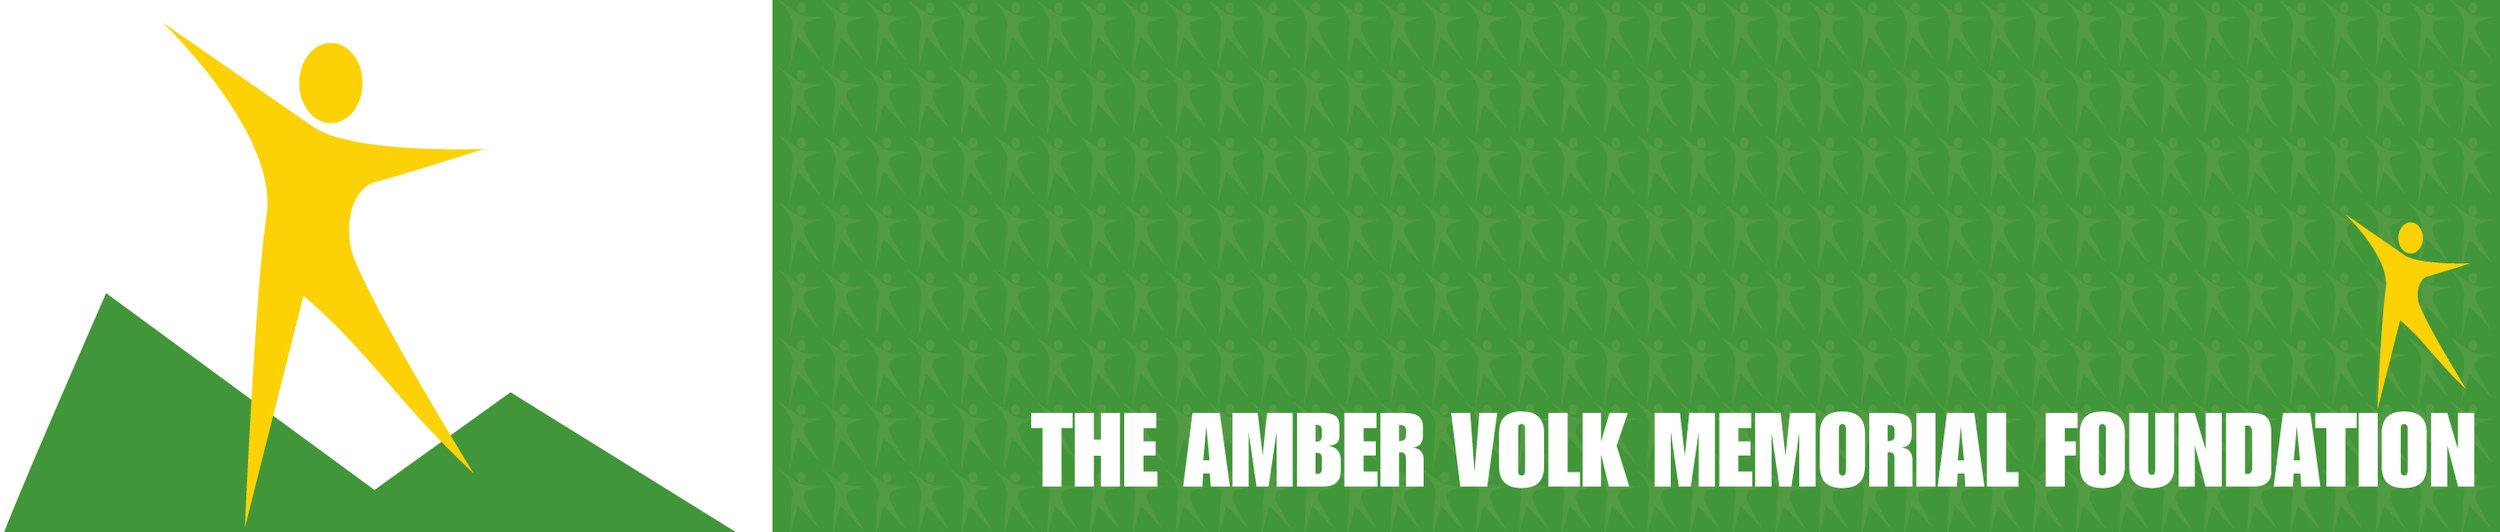 Amber Volk Foundation.jpg